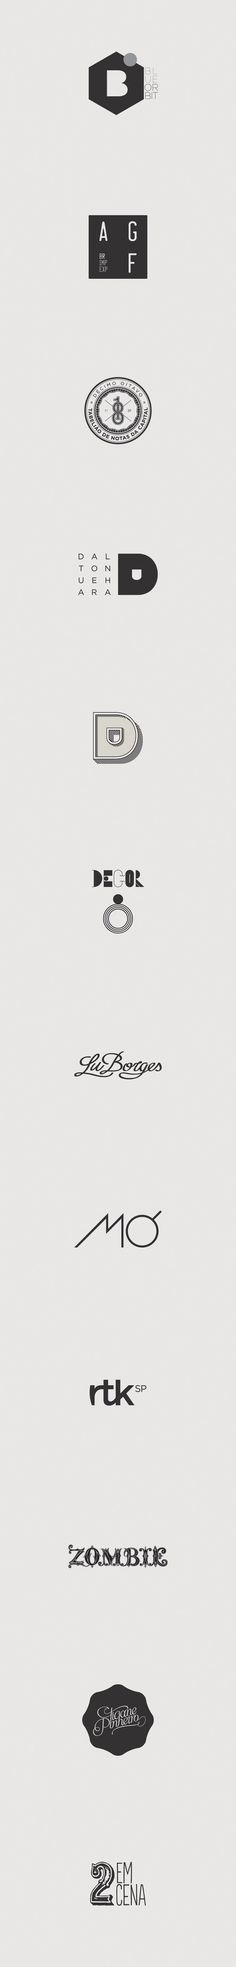 Compilation of logos 2012  by Pedro Paulino